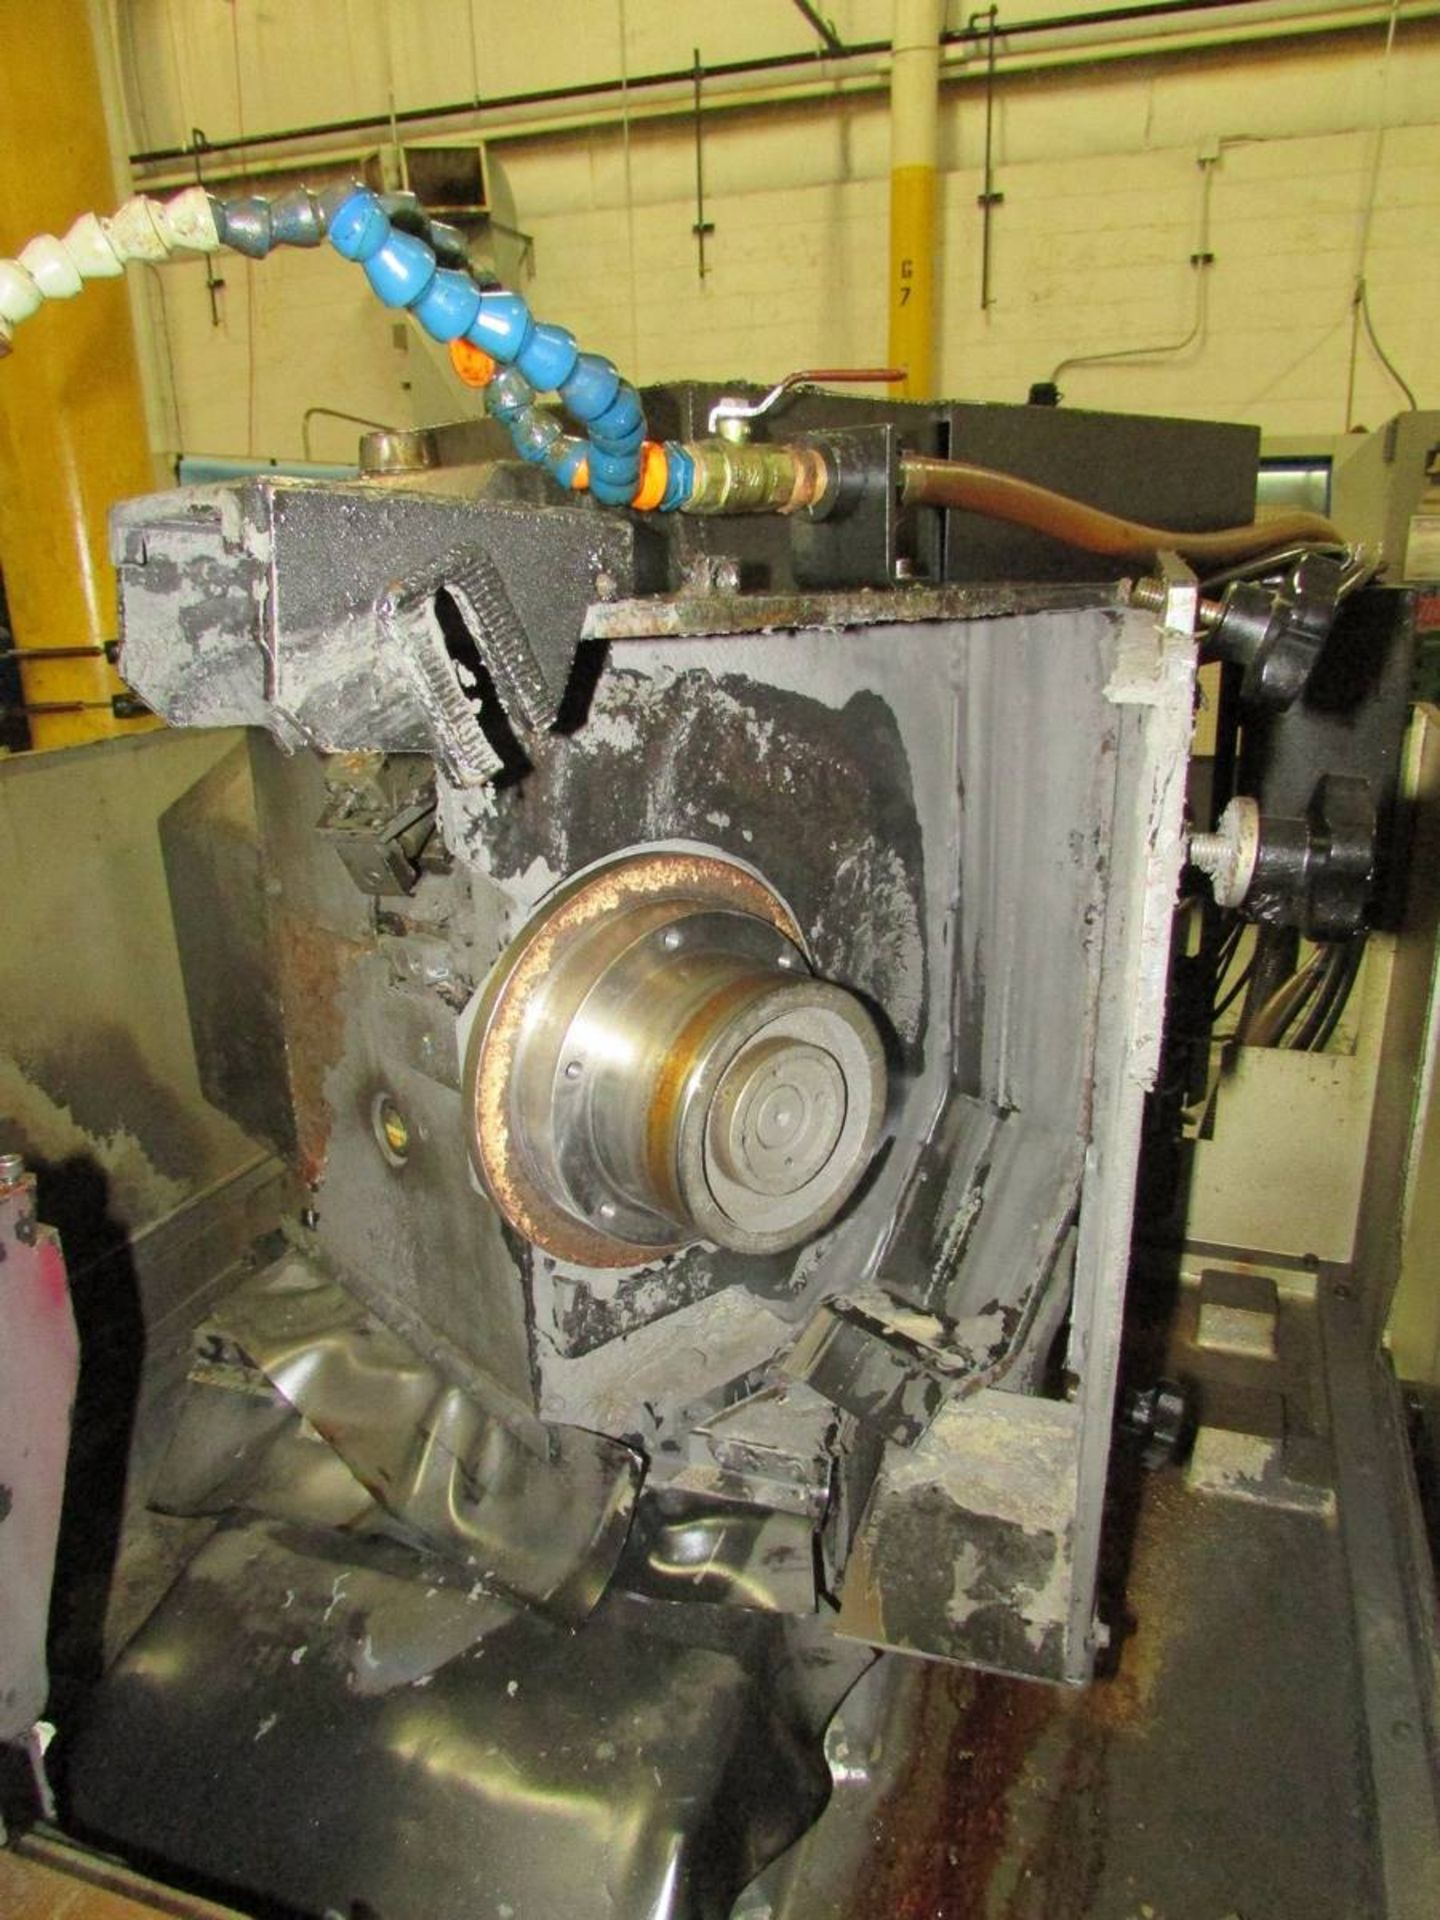 2012 Toyoda/ JTEKT 45m Select G II CNC OD Cylindrical Grinder - Image 4 of 21